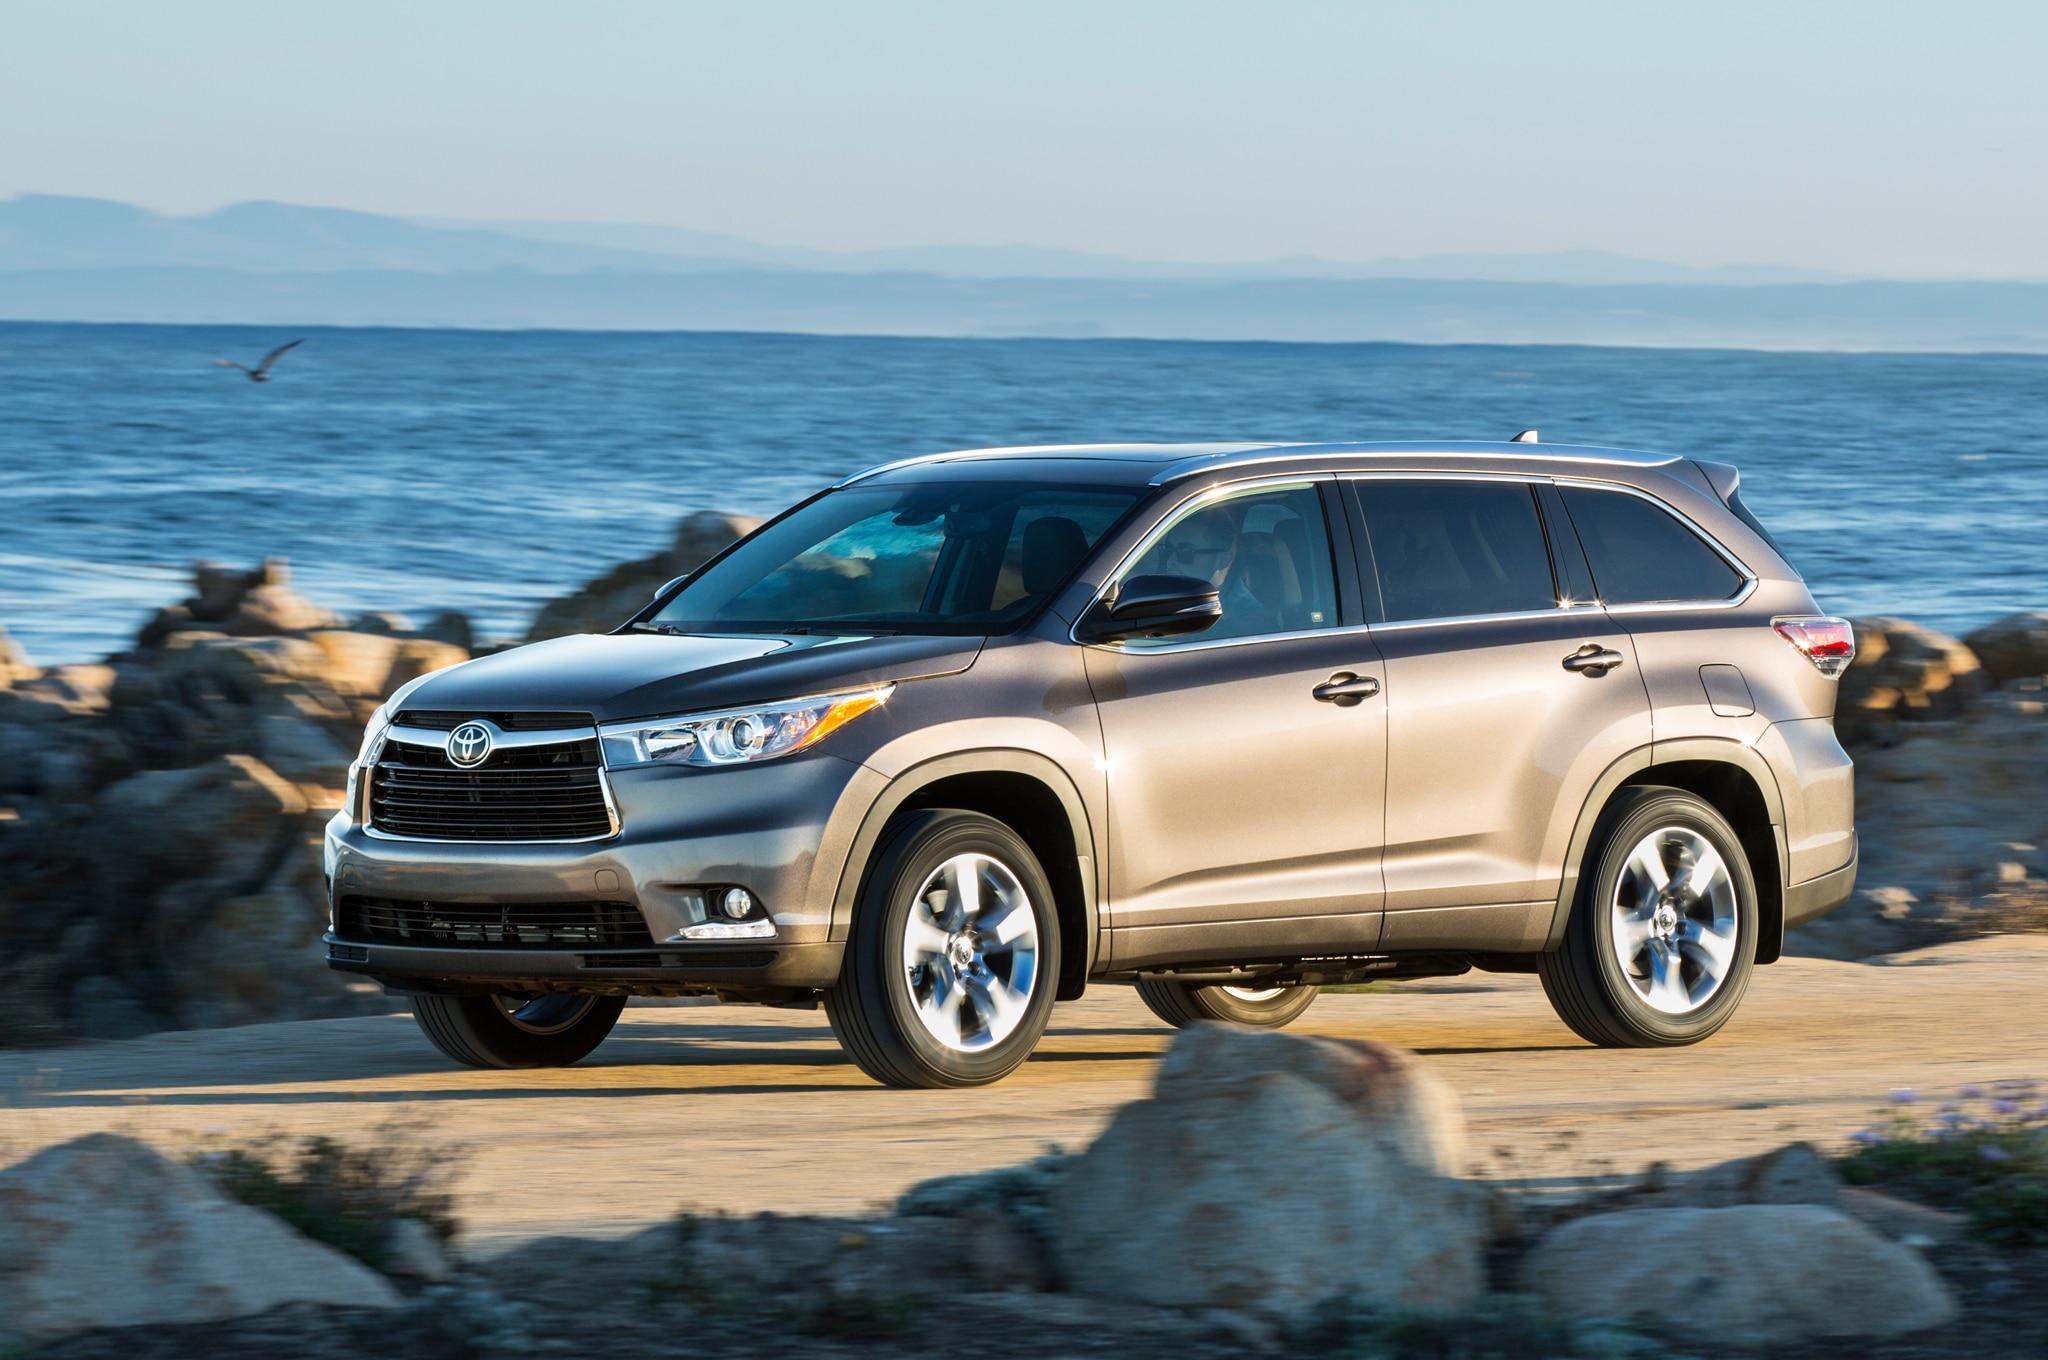 2014 Toyota Highlander Review